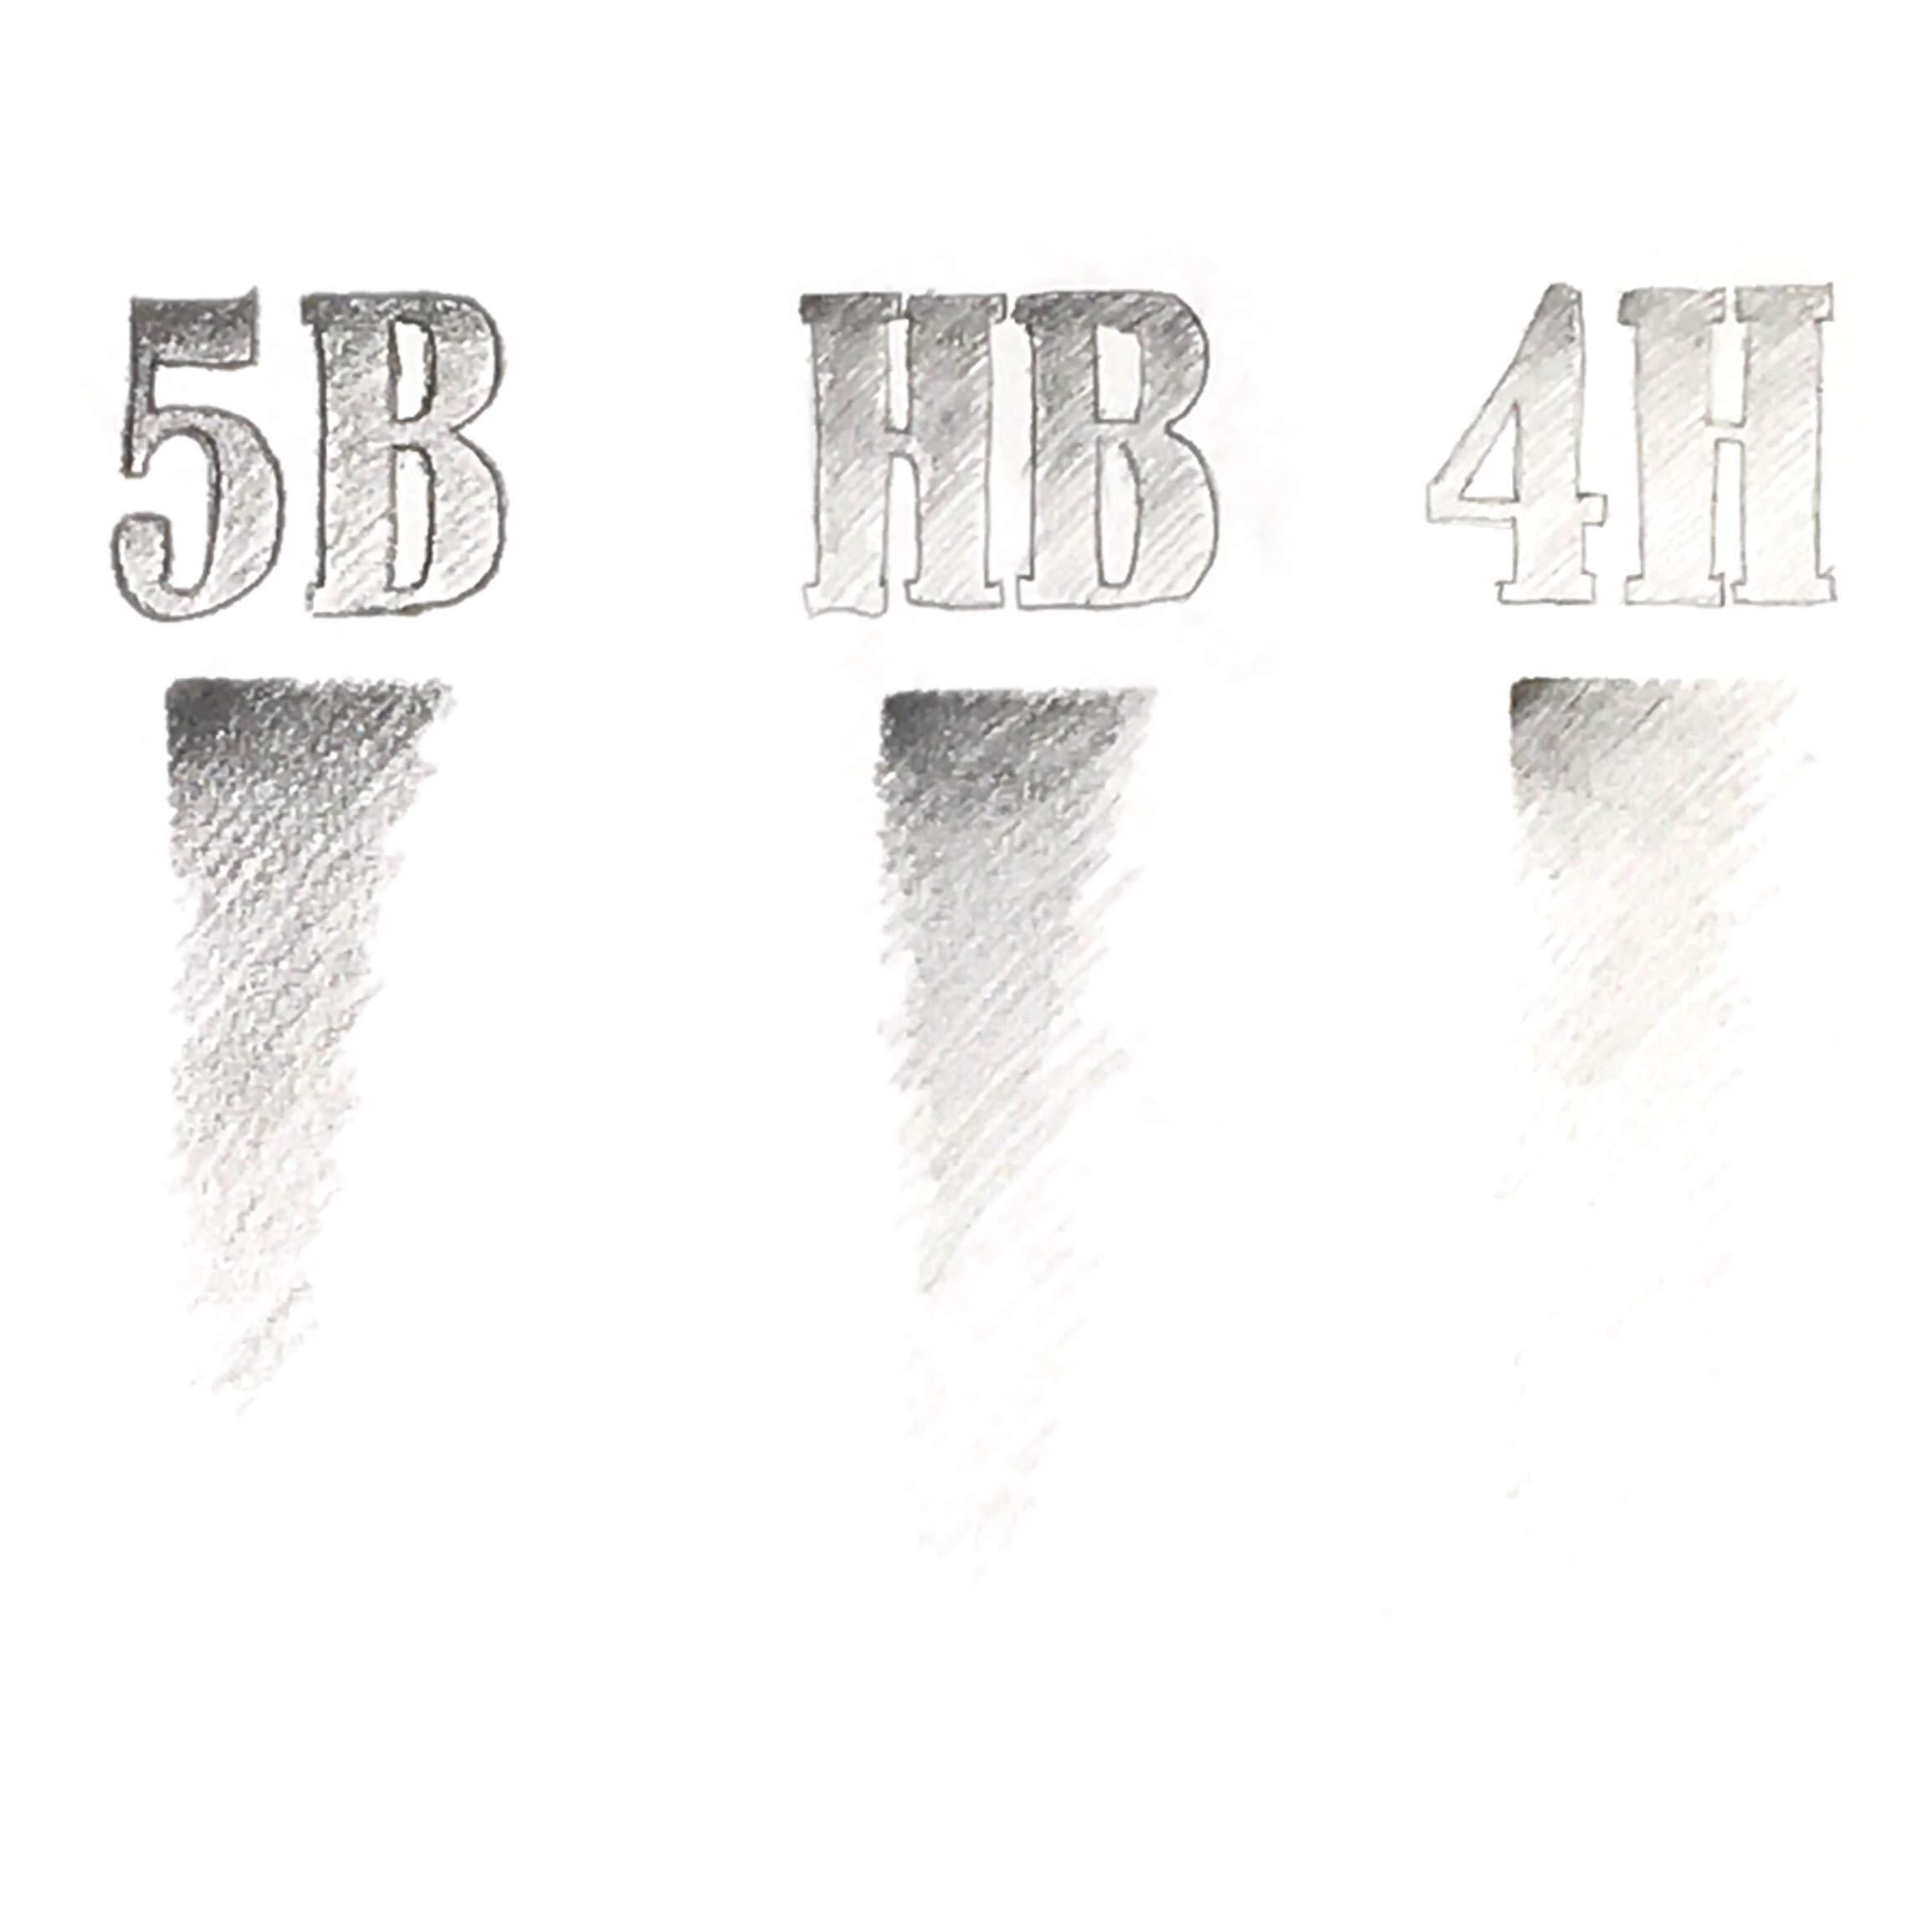 Drawing Mechanical Pencils 9-Piece | Kneaded Eraser | 2 mm Pencil Lead Refills for Artists | Travel Art Set Case | Professional Sketching & Drawing Kit | Metal Pen Barrel by MstrSktch (Image #7)